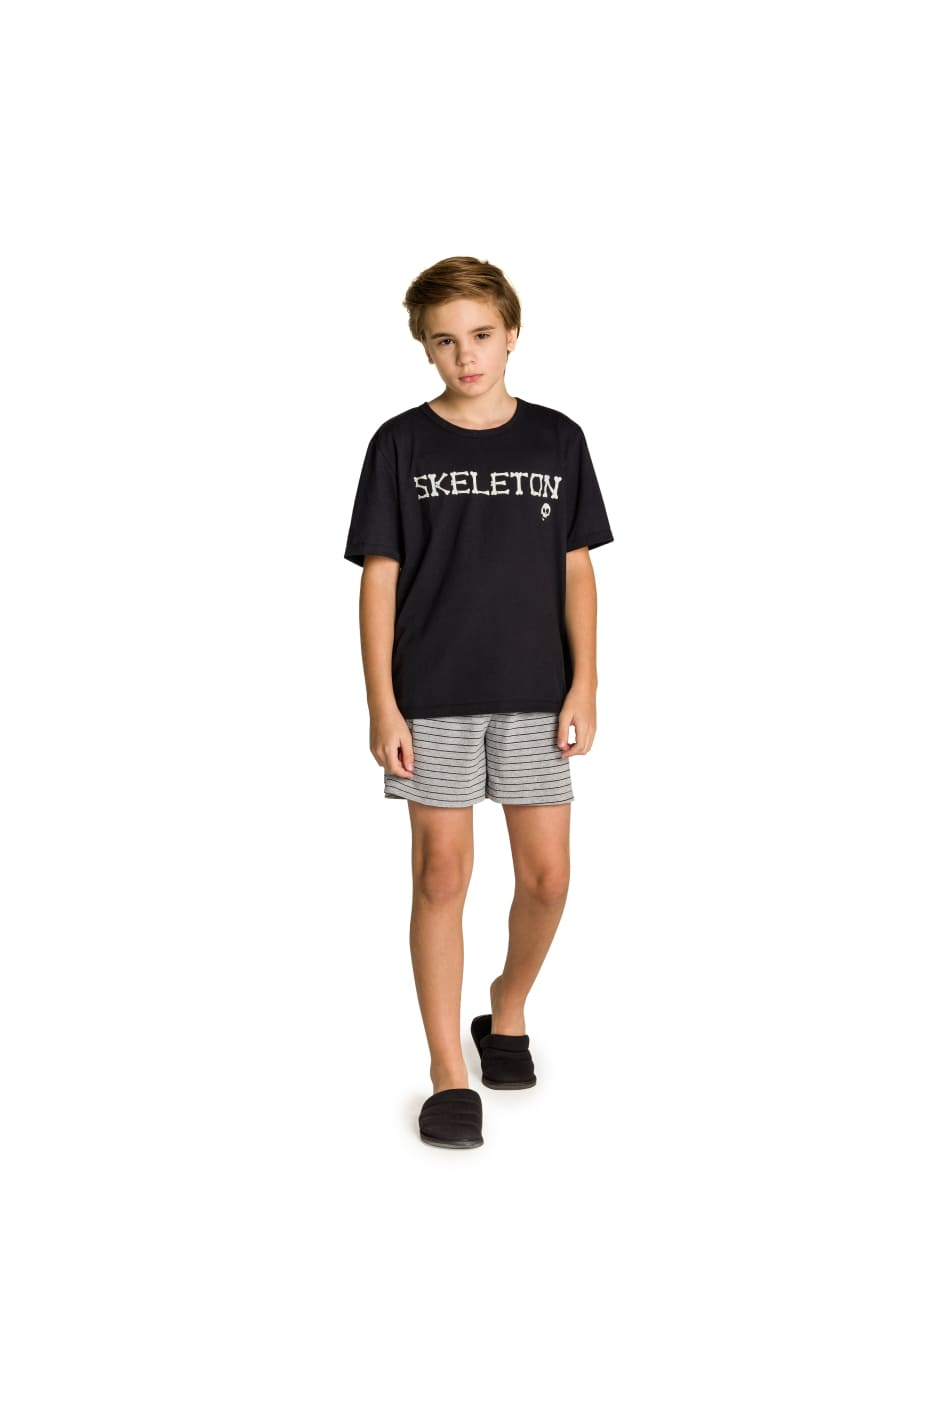 002/Q - Pijama Juvenil Masculino Família Skeleton - Brilha no Escuro